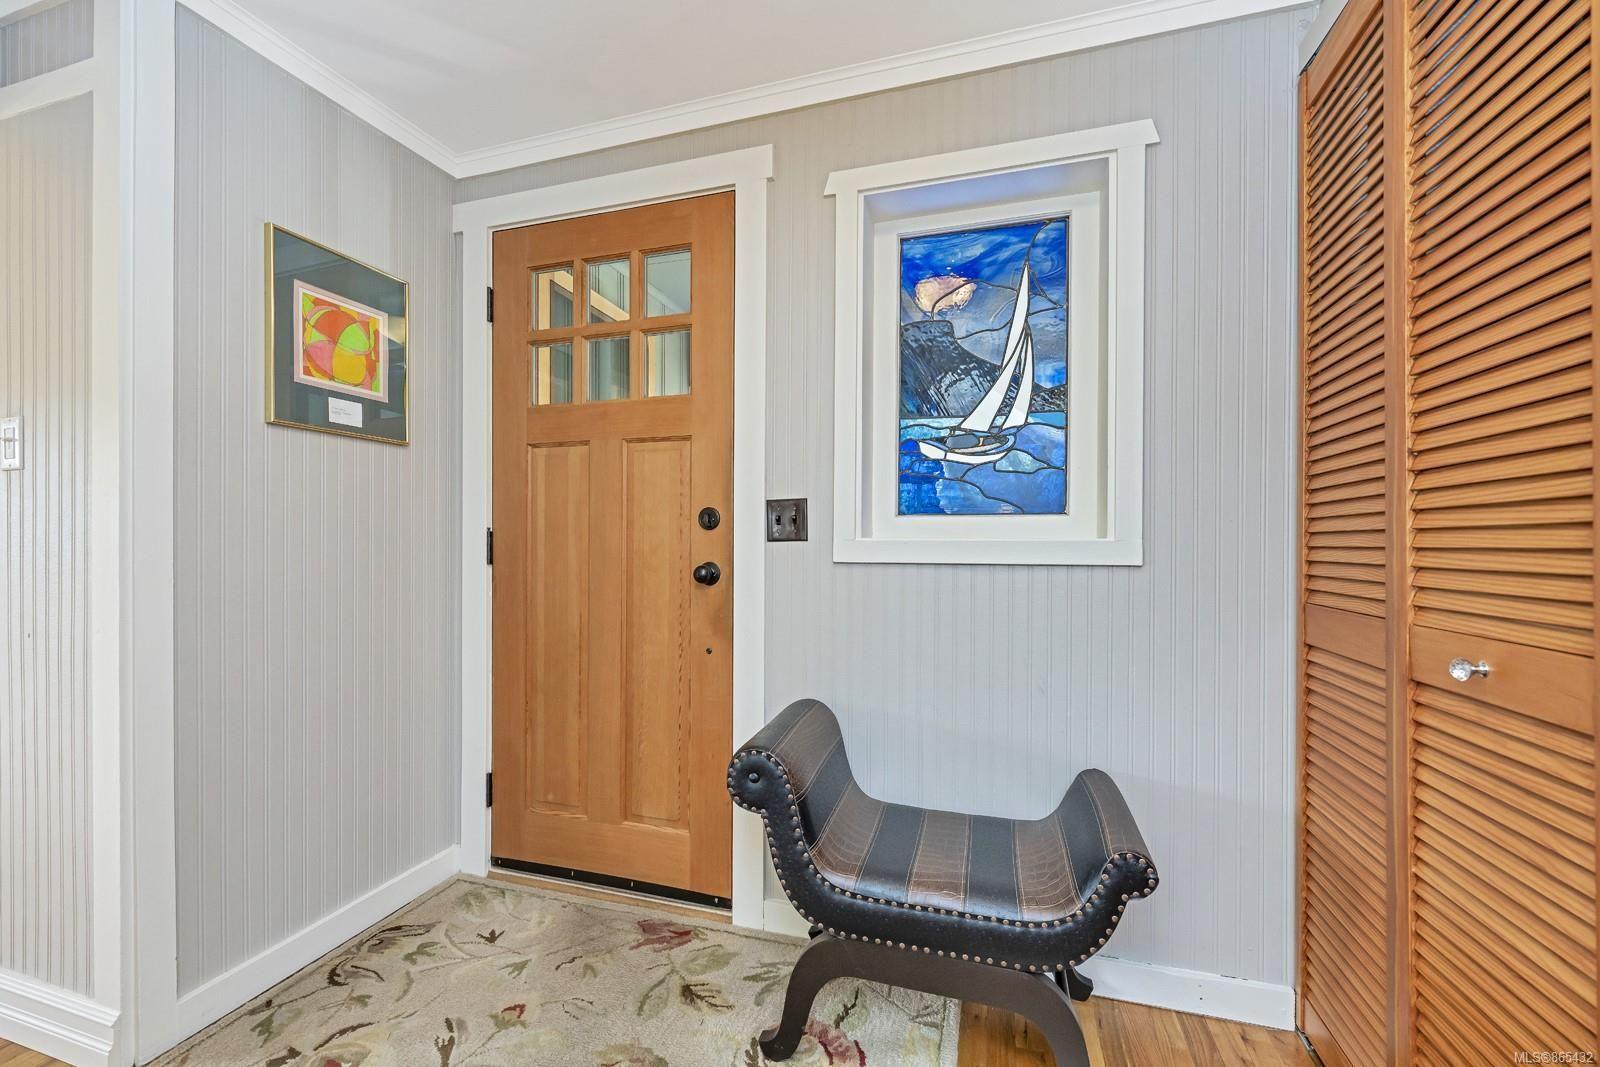 Photo 5: Photos: 6734 Drummond Dr in : Du East Duncan House for sale (Duncan)  : MLS®# 865432